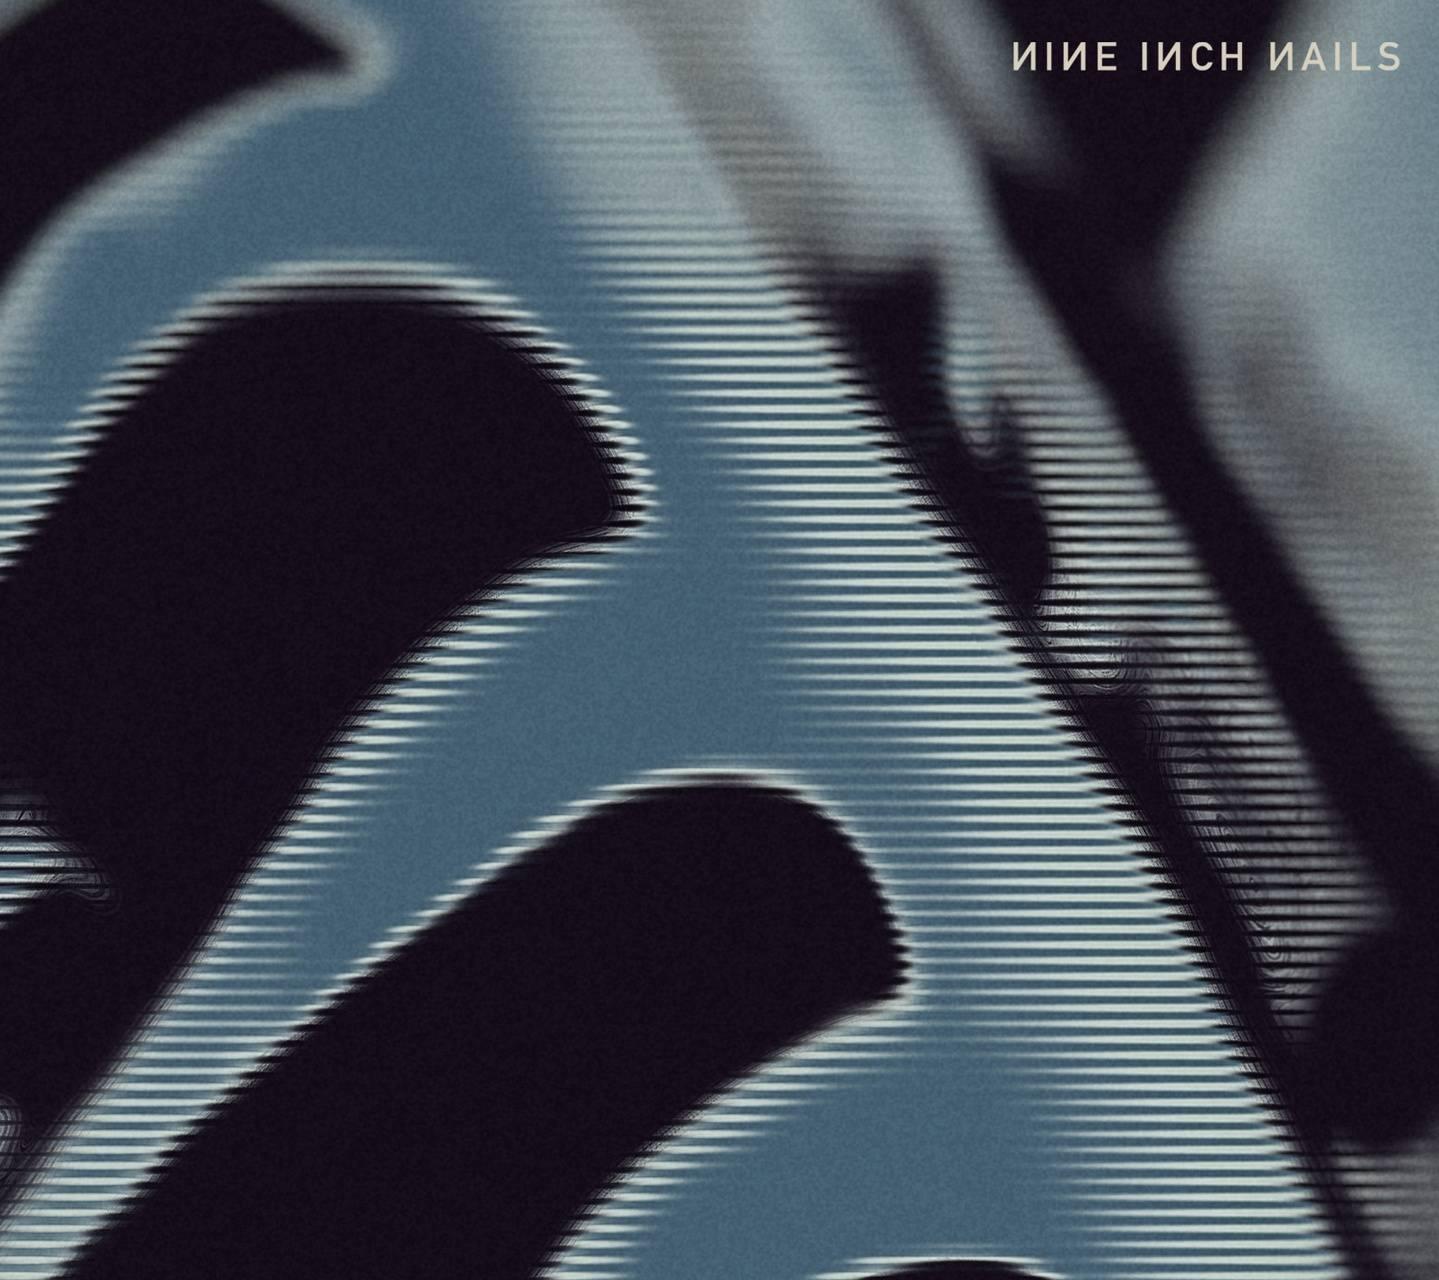 Nine Inch Nails Wallpaper By Neuralblastoma 72 Free On